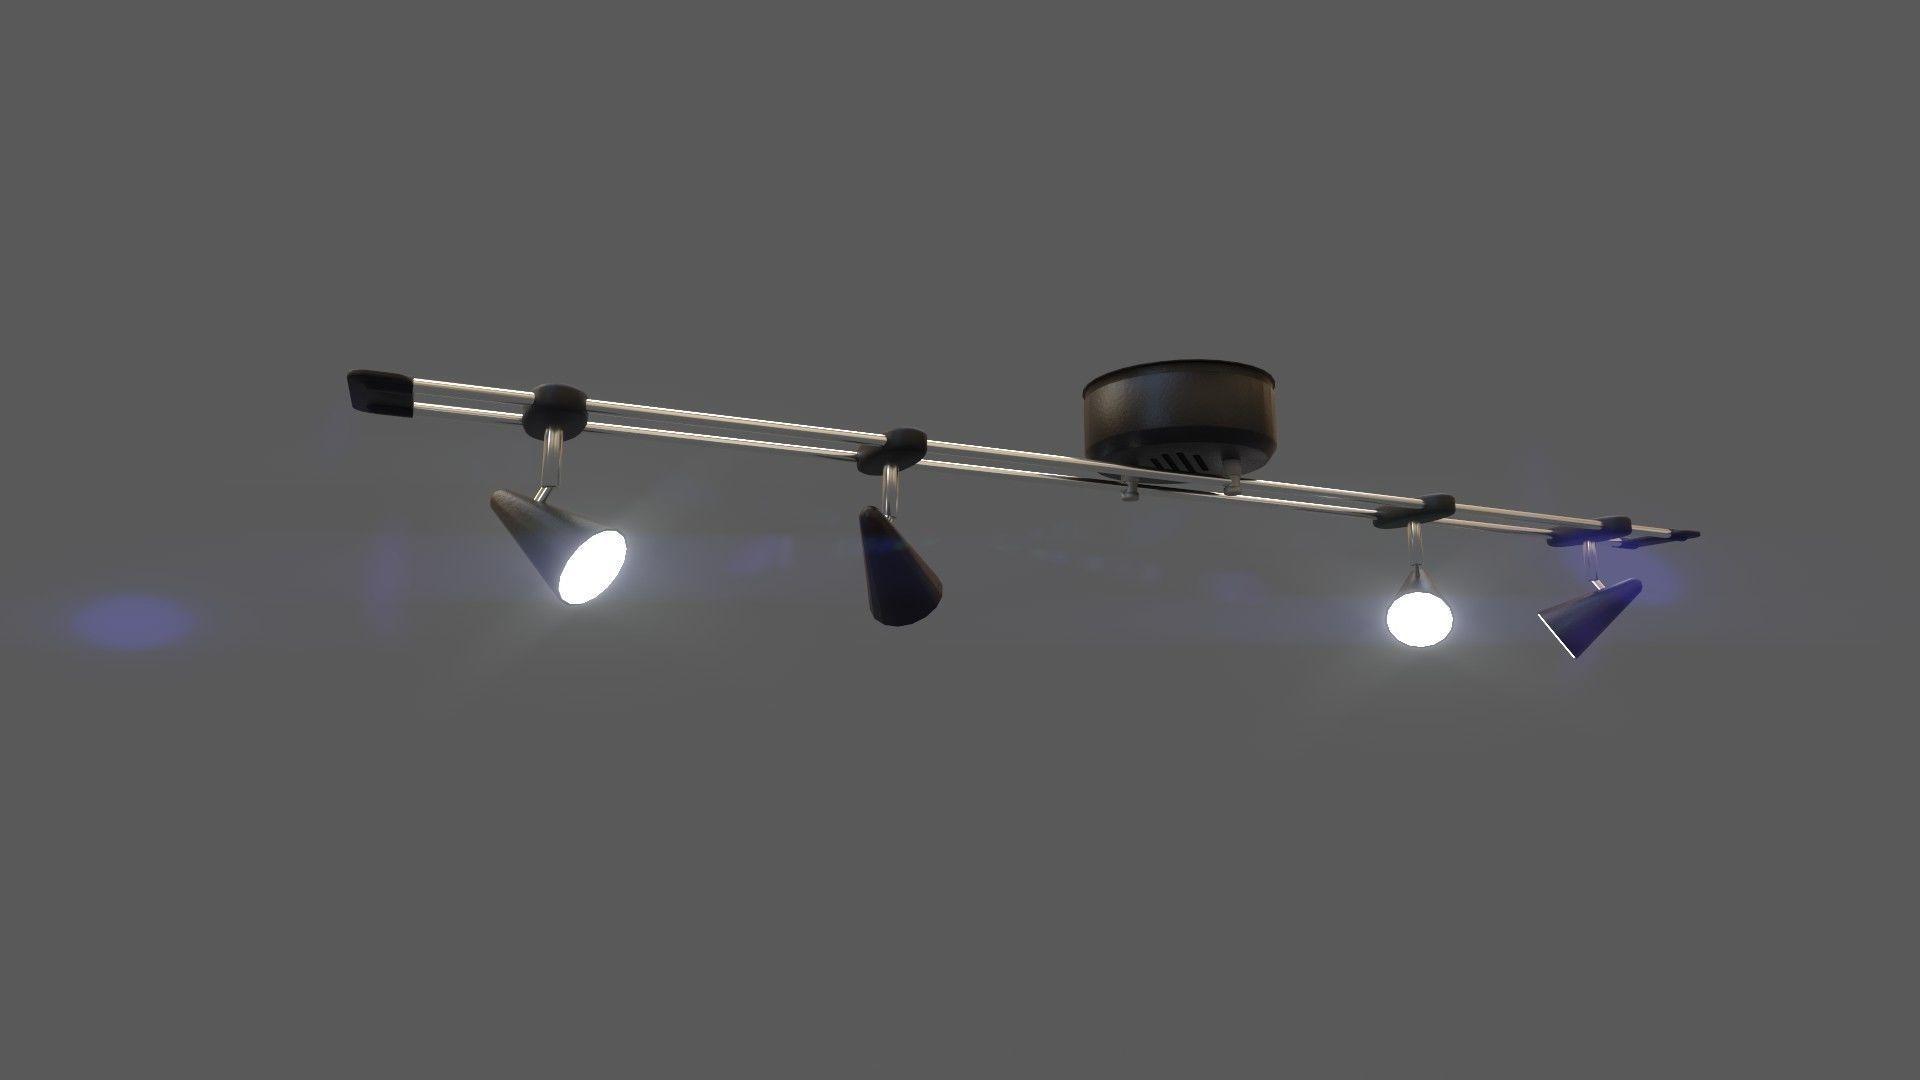 Halogen Ceiling Light With Ue4 Blueprint Game 3d Model